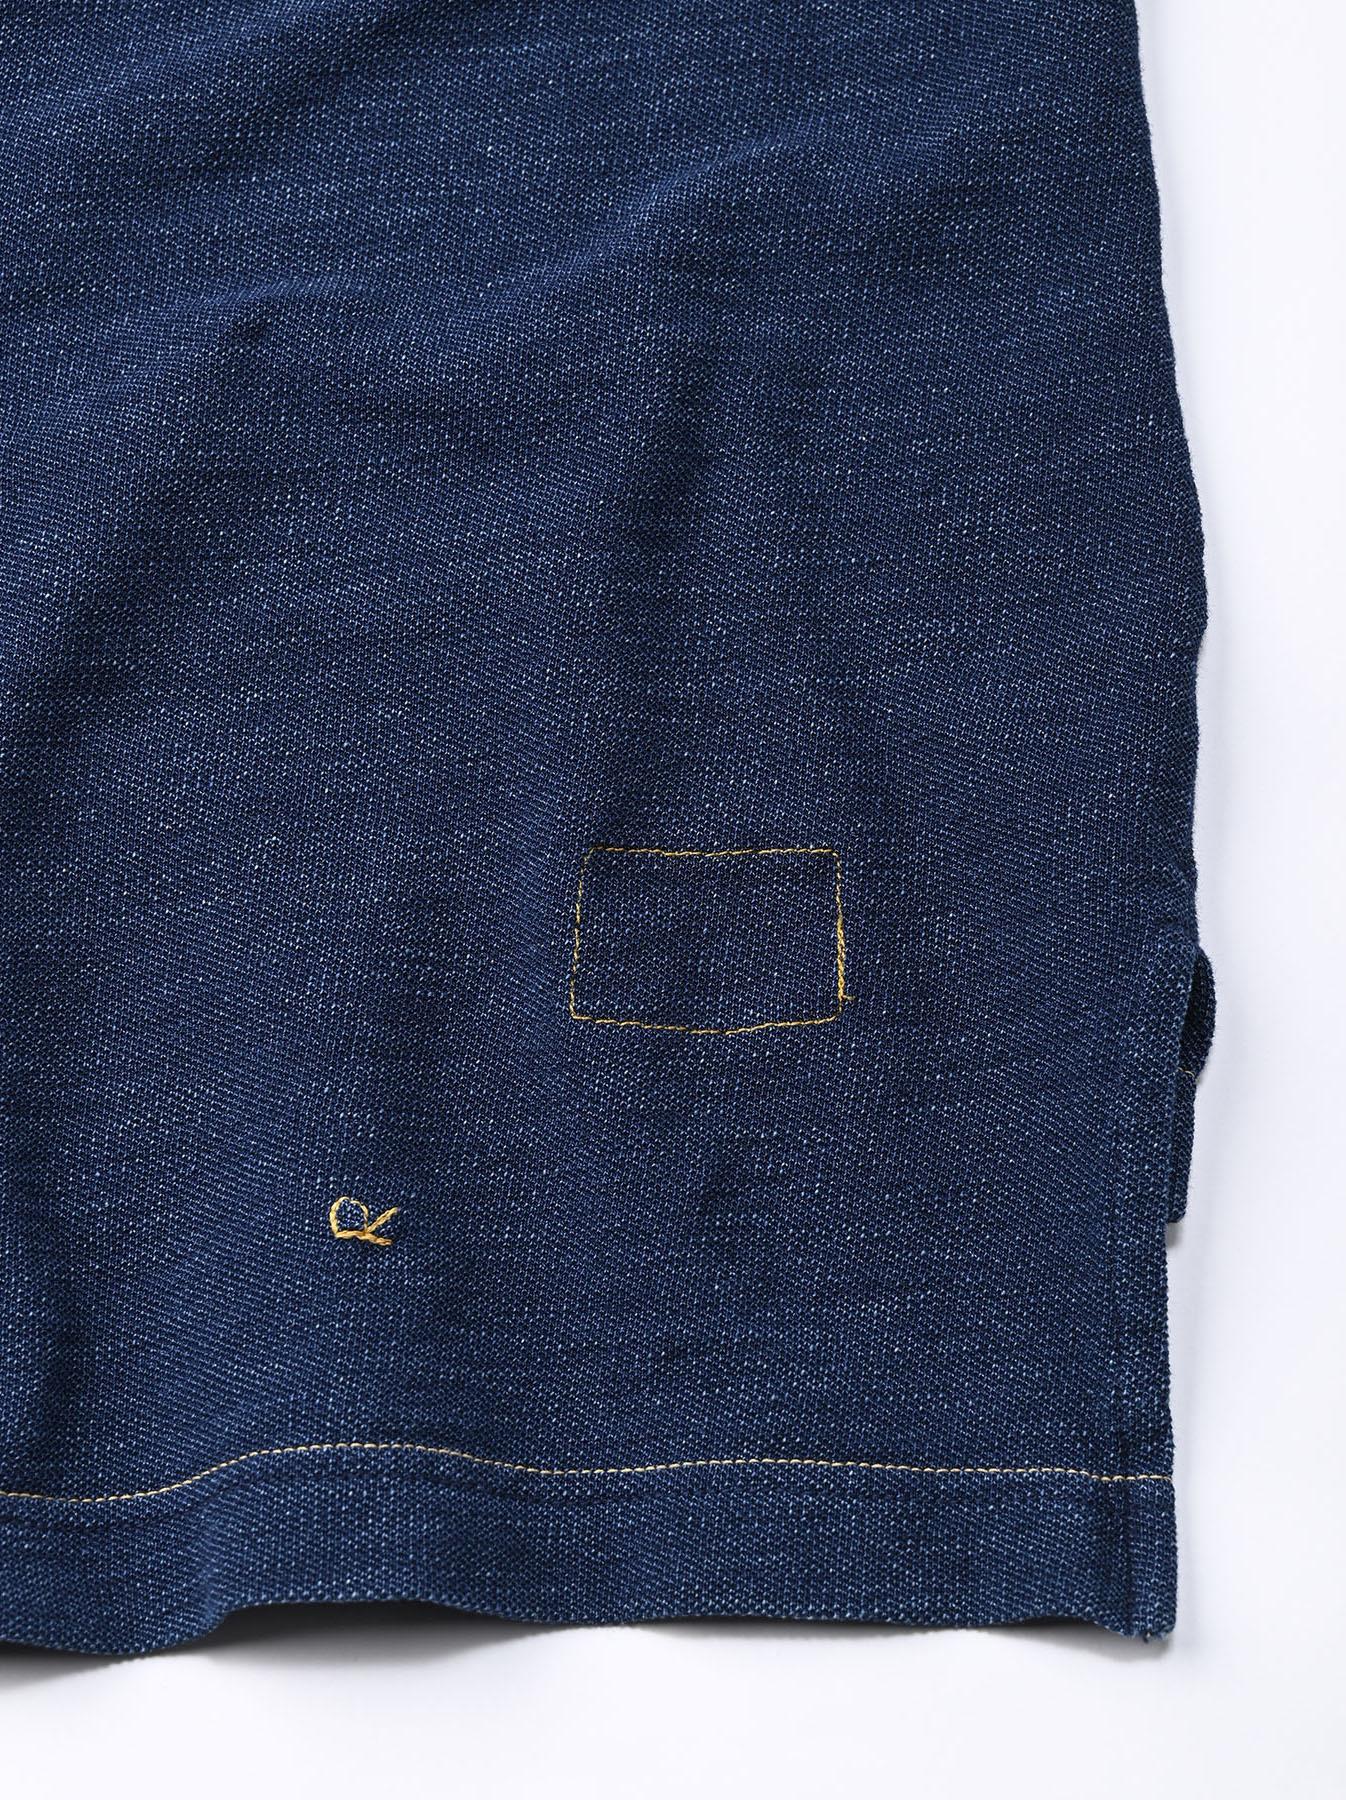 Indigo Kanoko Shiokaze Long-sleeved Square Polo Shirt (0521)-11